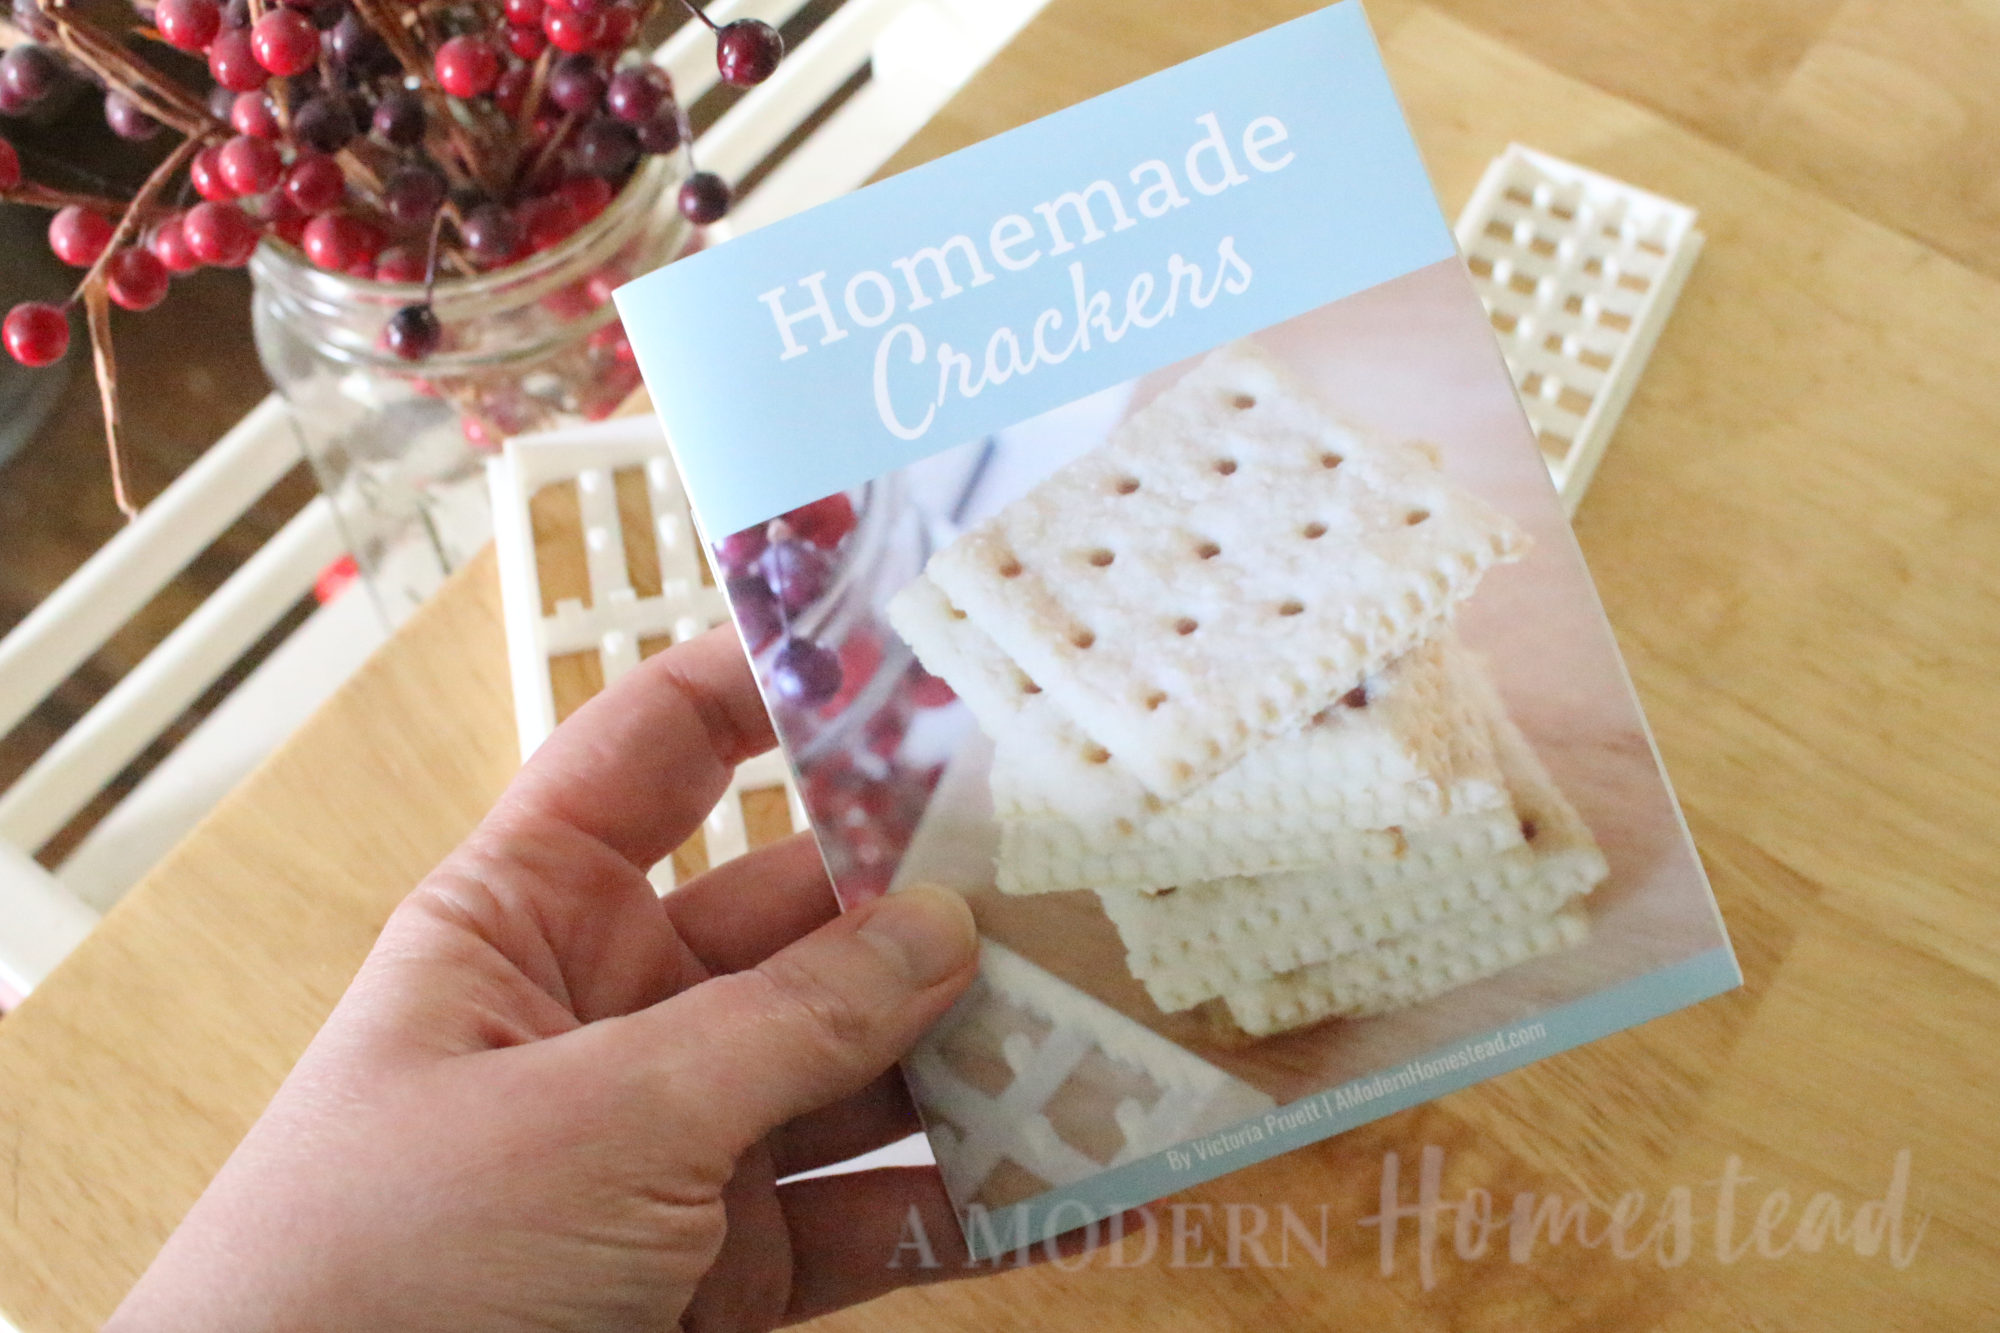 Homemade Cracker recipe booklet cover in hand